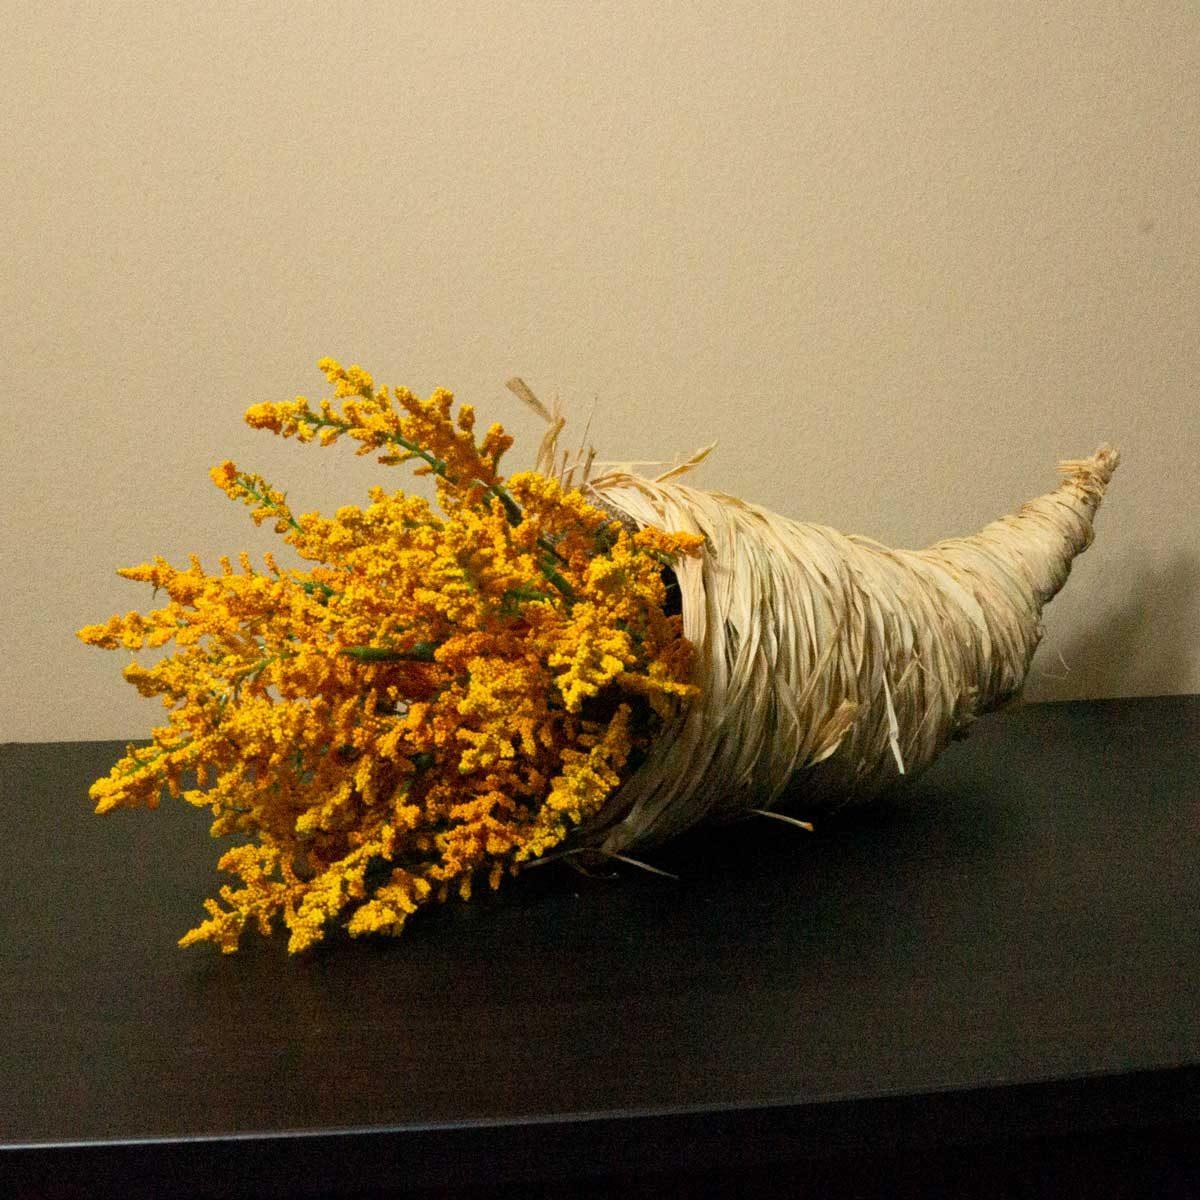 DIY cornucopia with yellow flowers